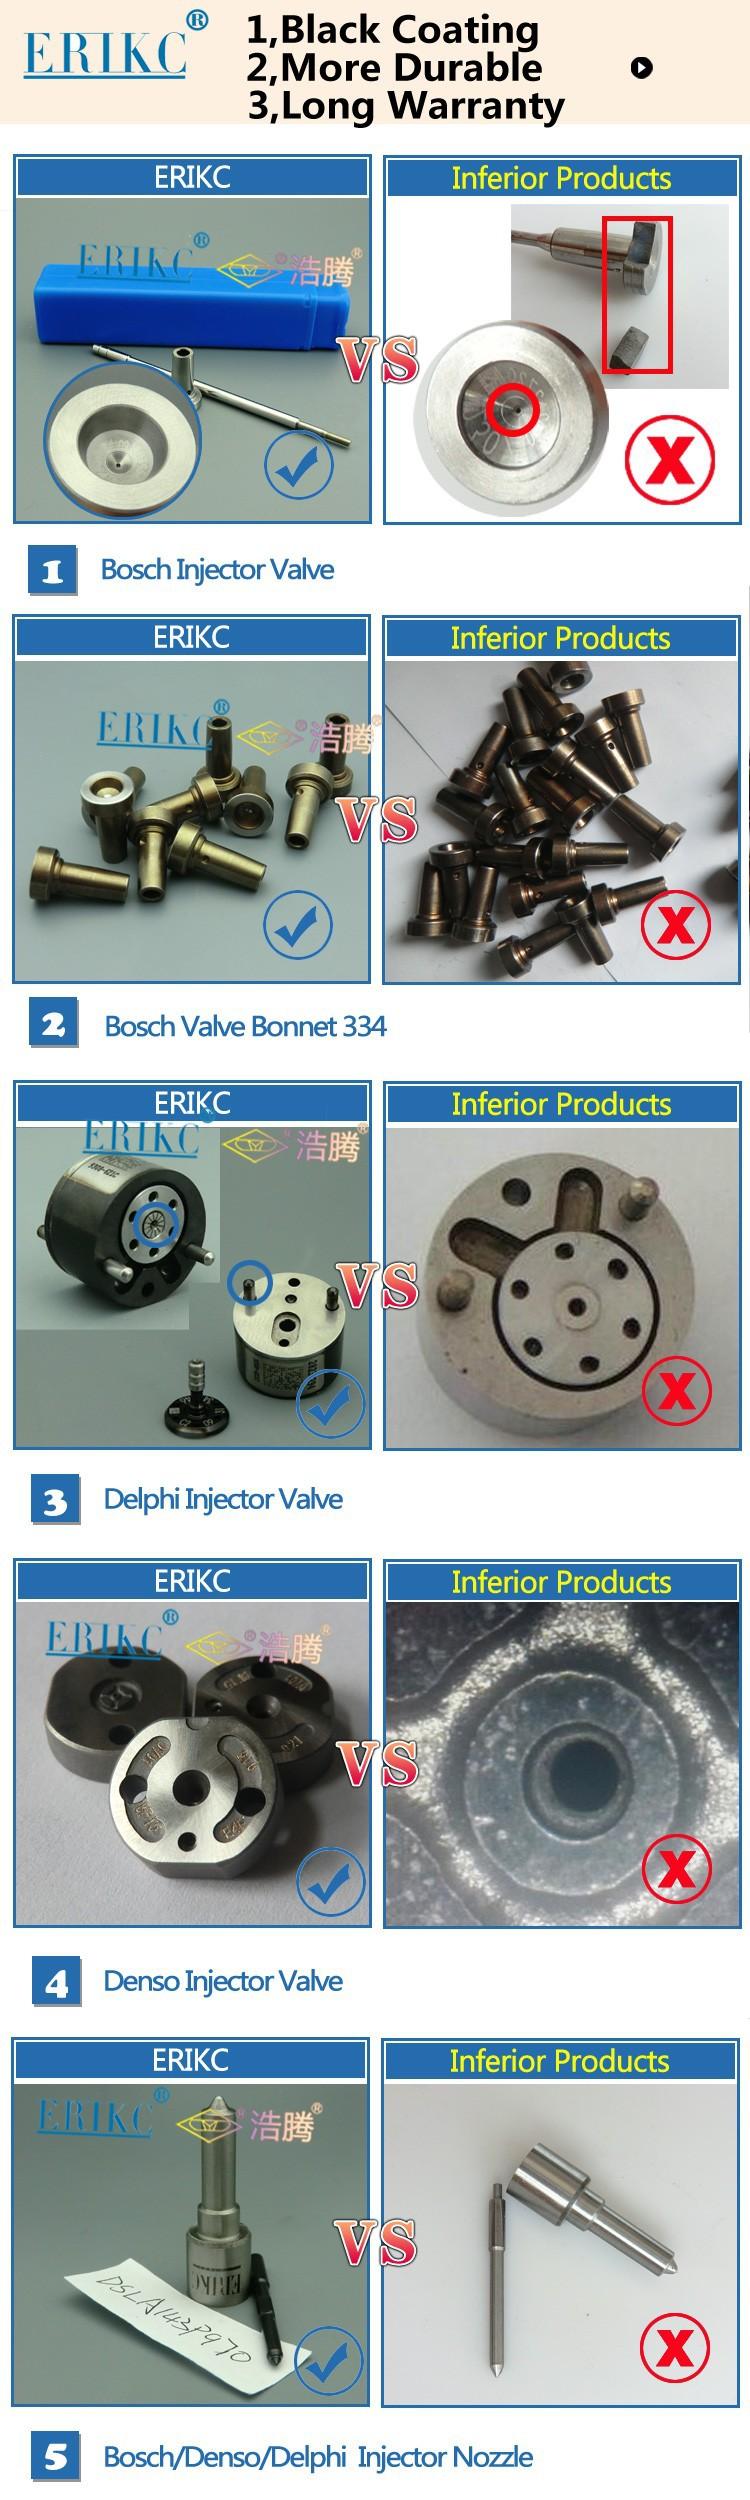 ERIKC LISERON common rail product (1)